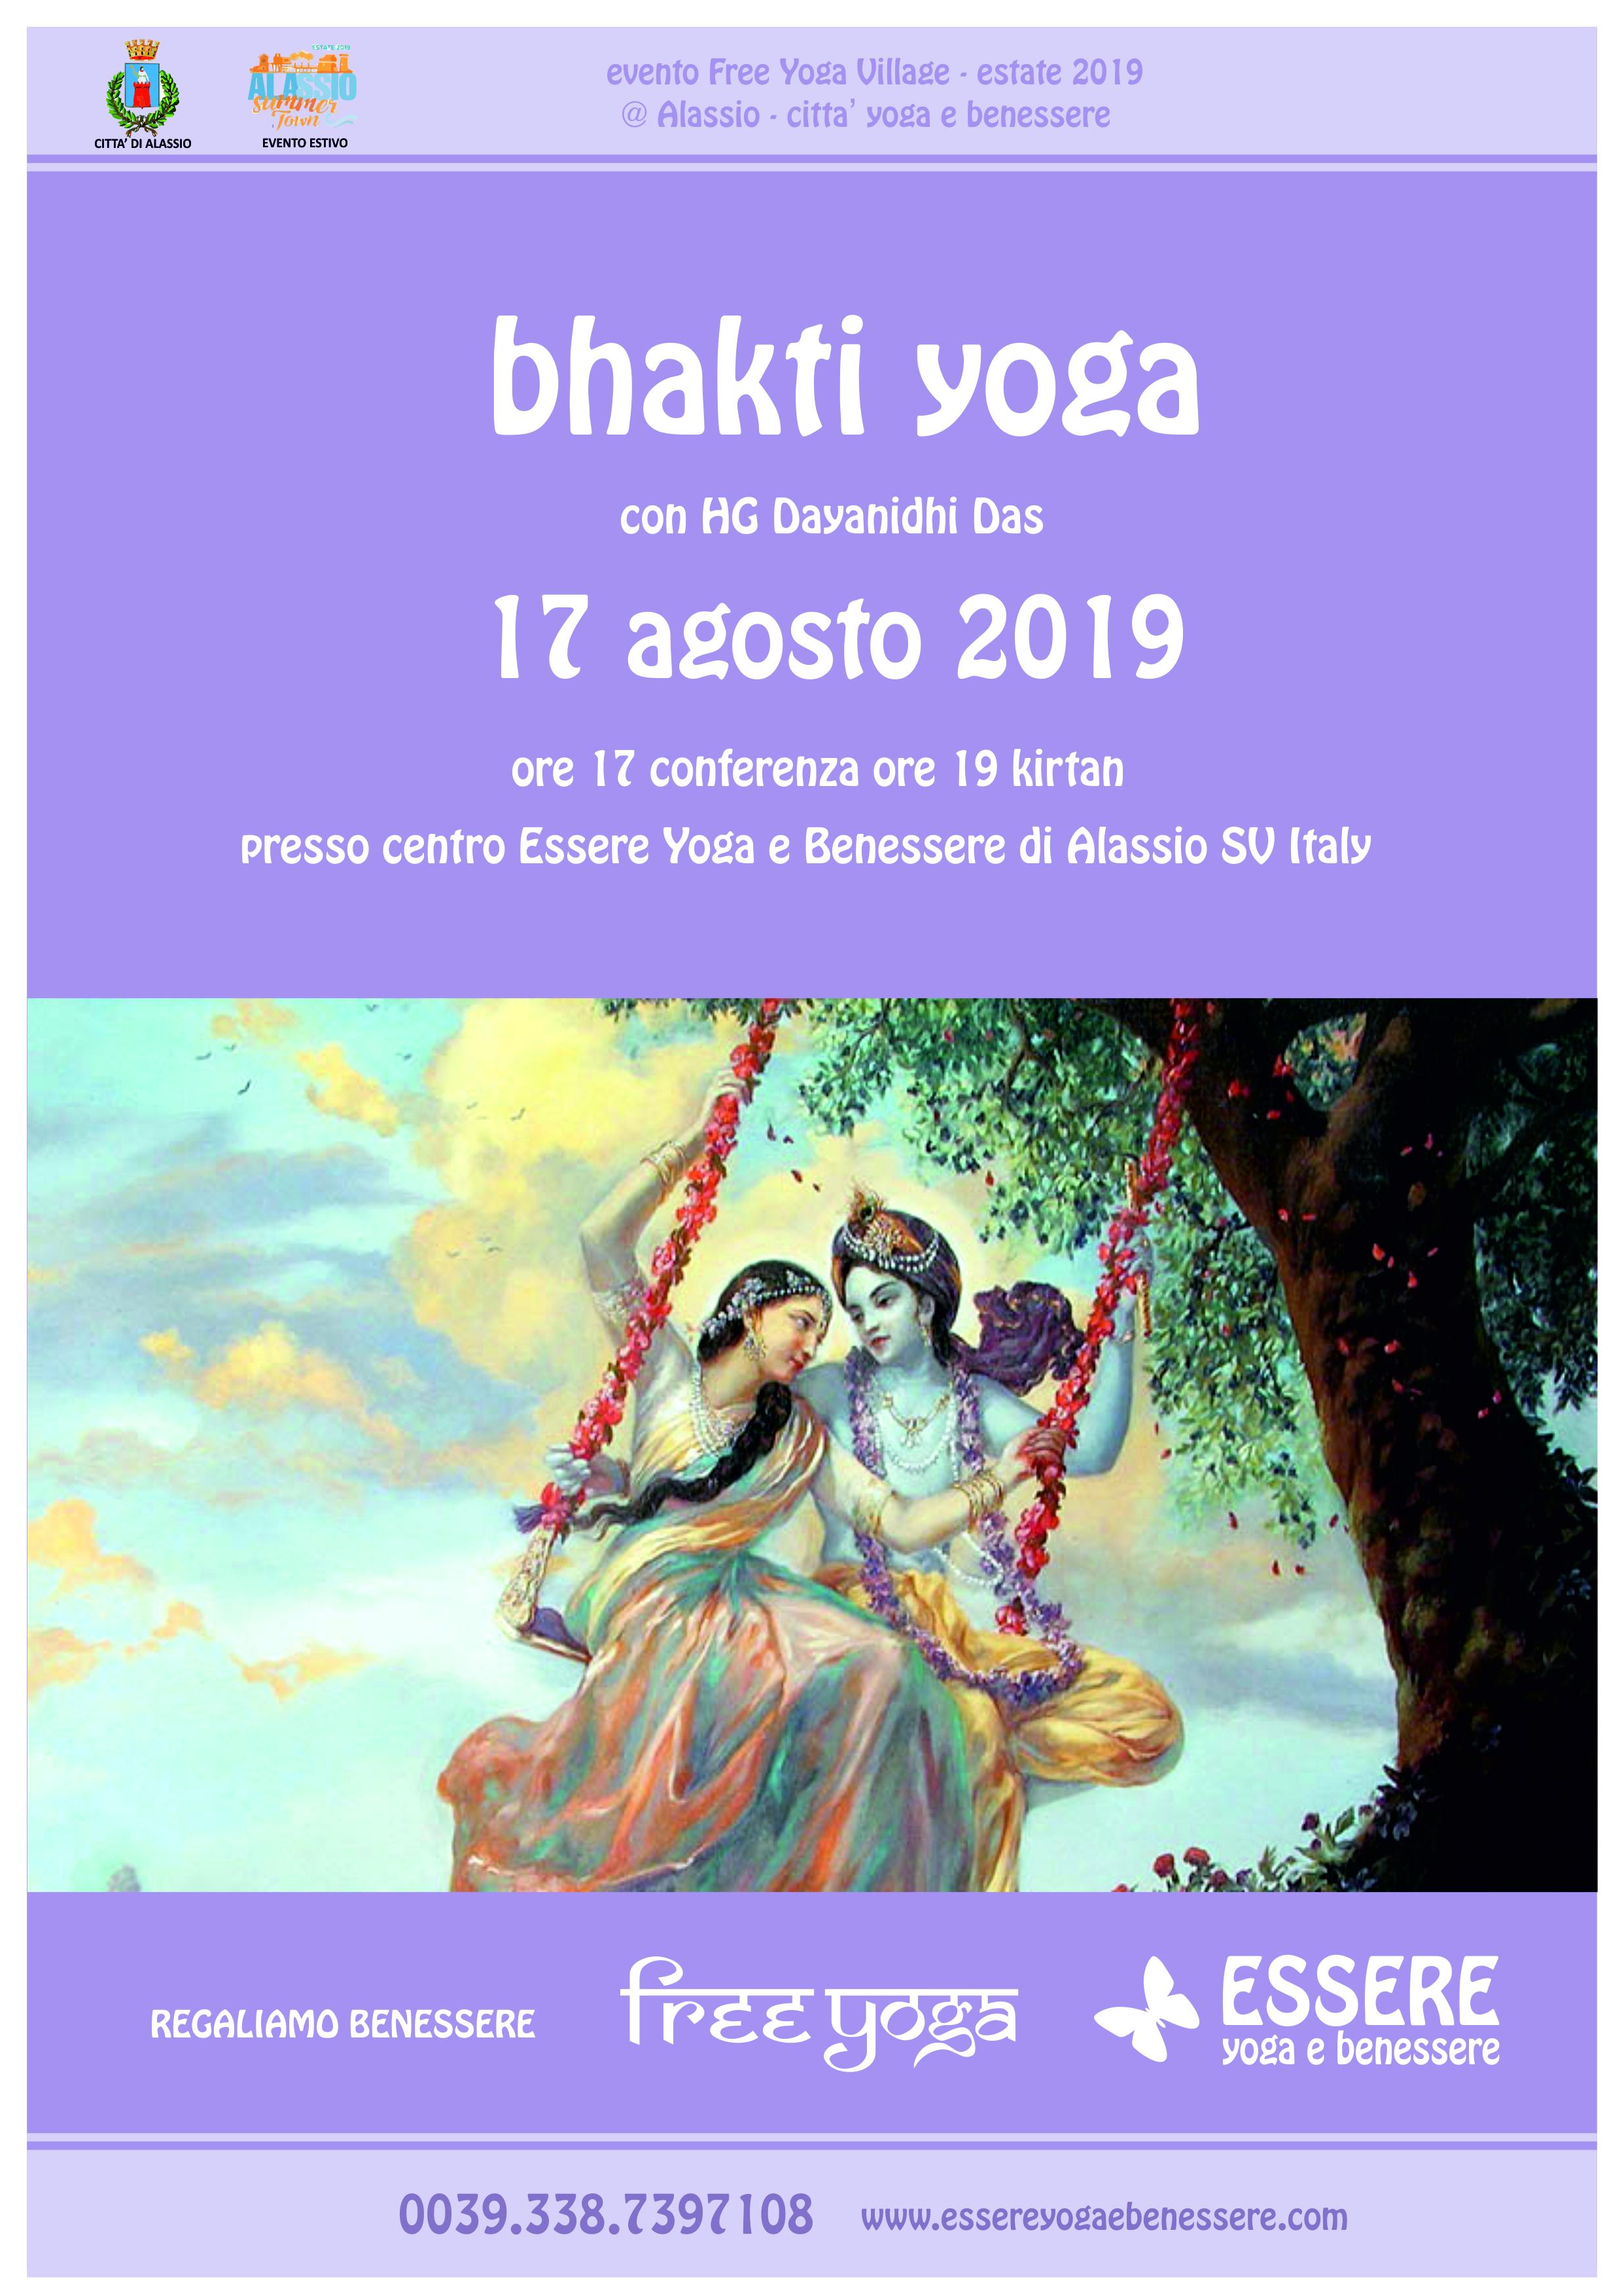 bhakti-essere-free-yoga-gratuito-benessere-per-tutti-village-citta-alassio-estate-lucia-ragazzi-kirtan-krishna-bagavad-gita-summer-town-wellness